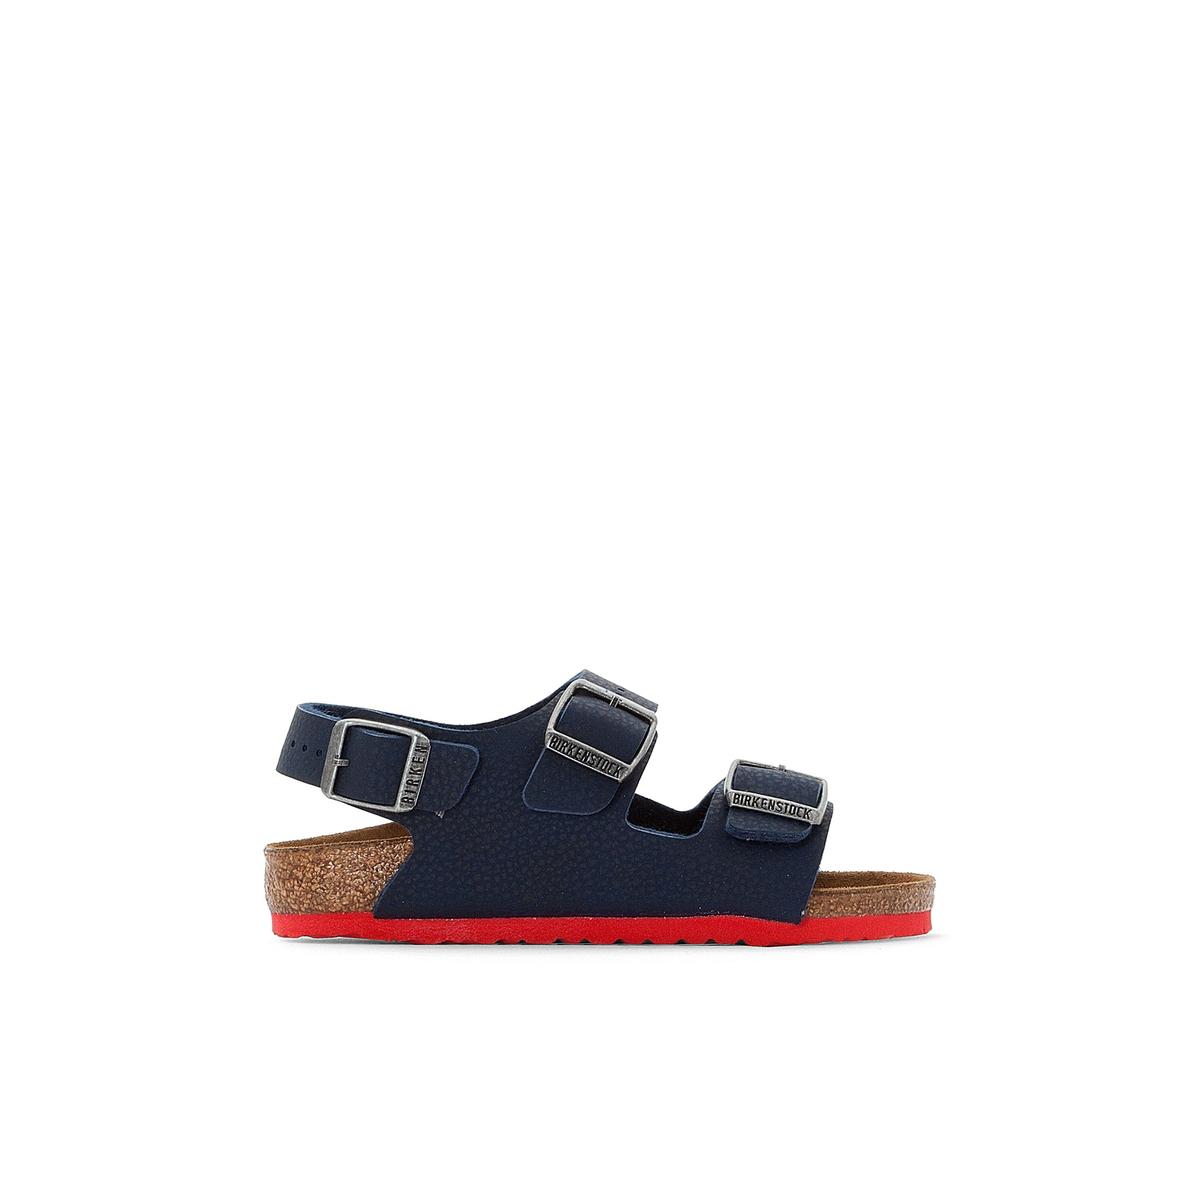 Сандалии на плоской подошве Milano 24-38 сандалии на плоской подошве с ремешком и пряжкой mundi